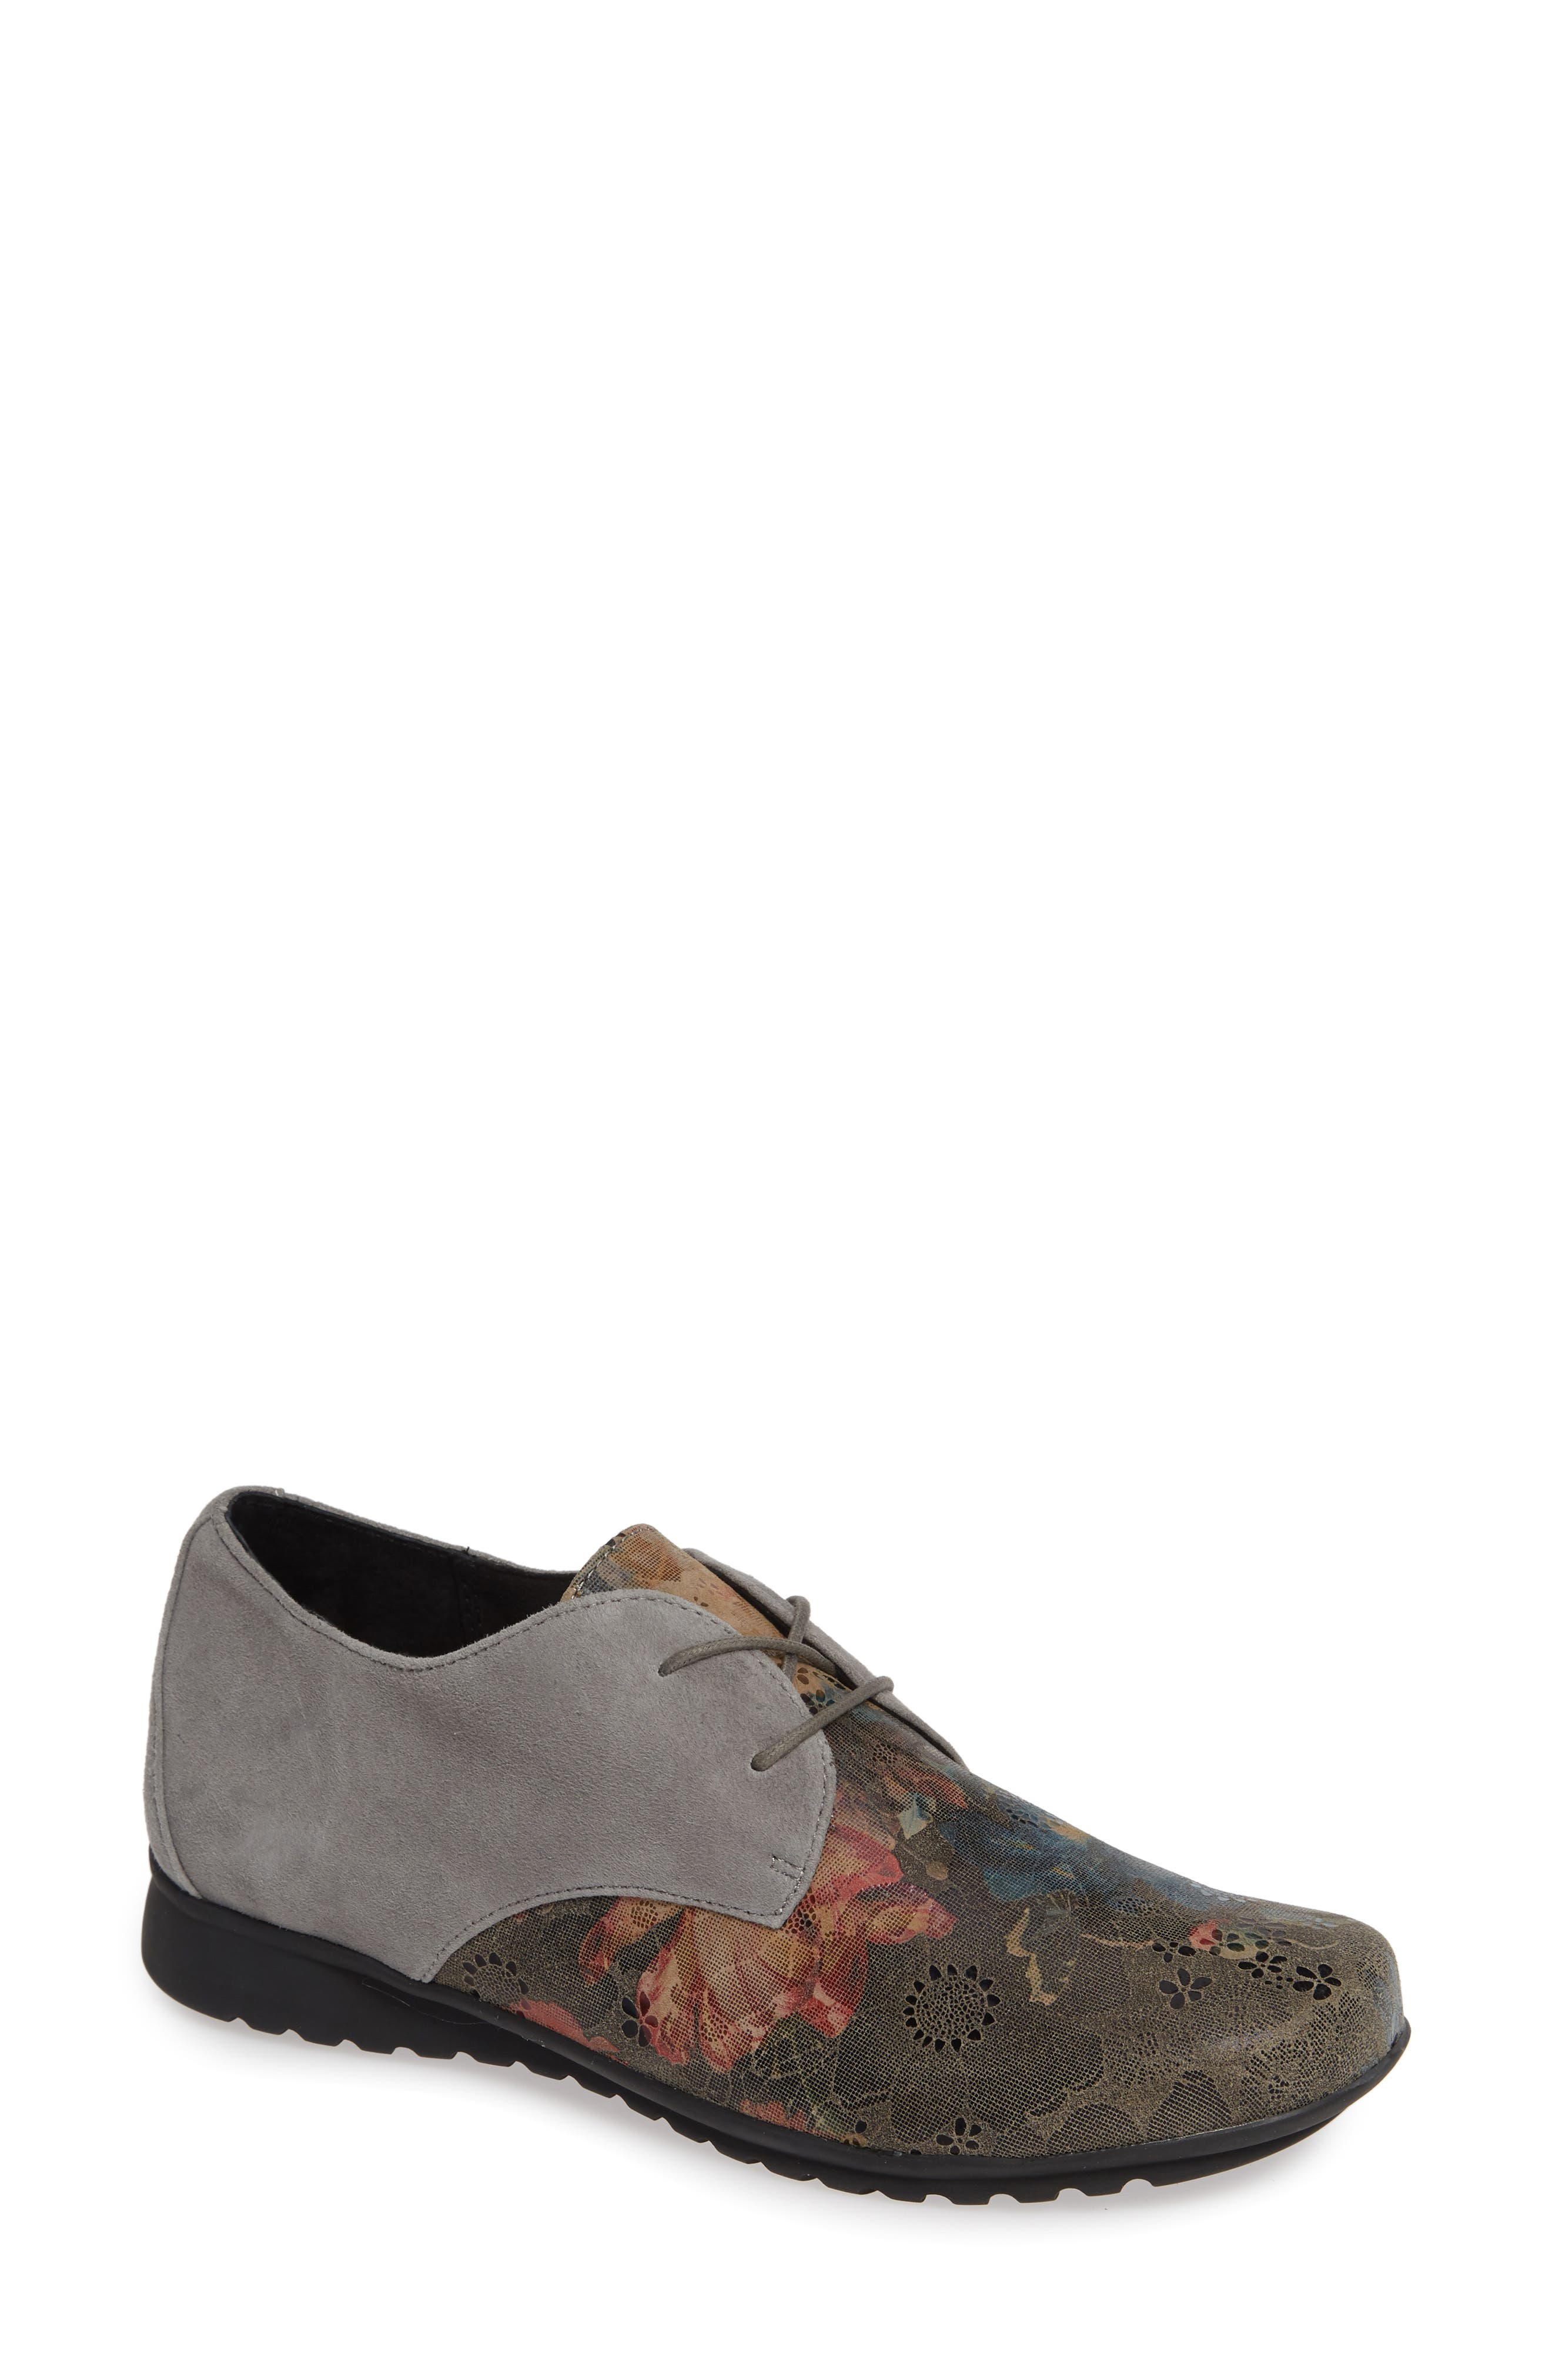 Aetrex Erin Saddle Shoe, Grey